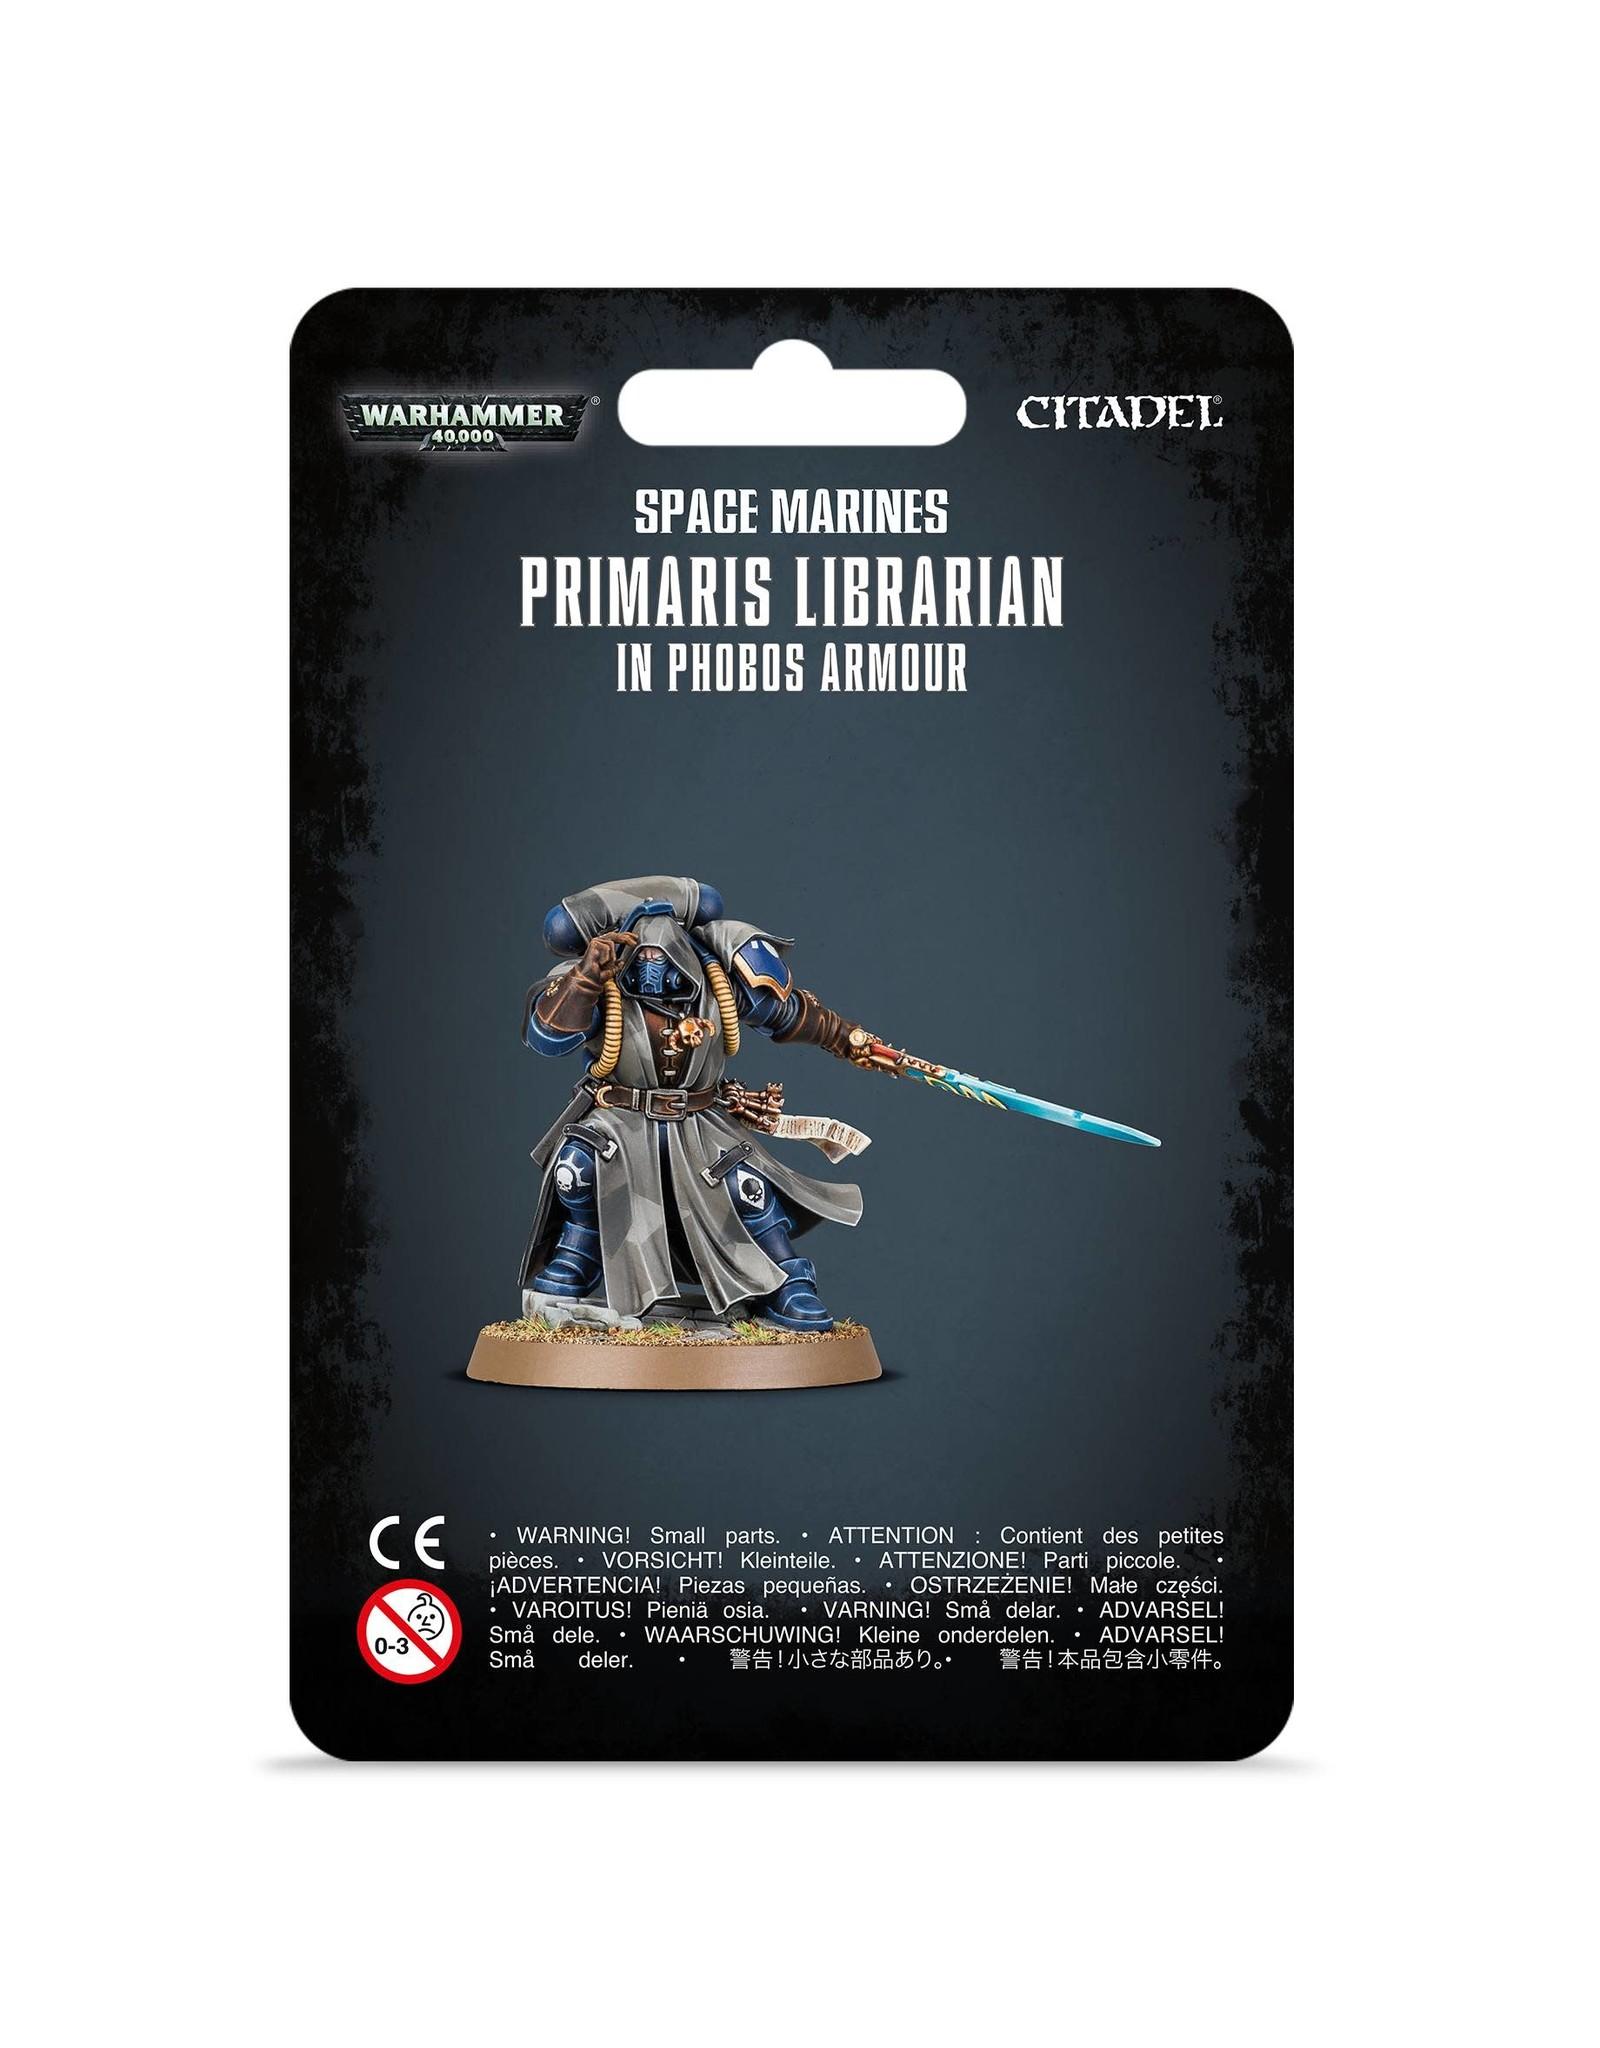 Warhammer 40,000 Space Marines: Primaris Librarian in Phobos Armour